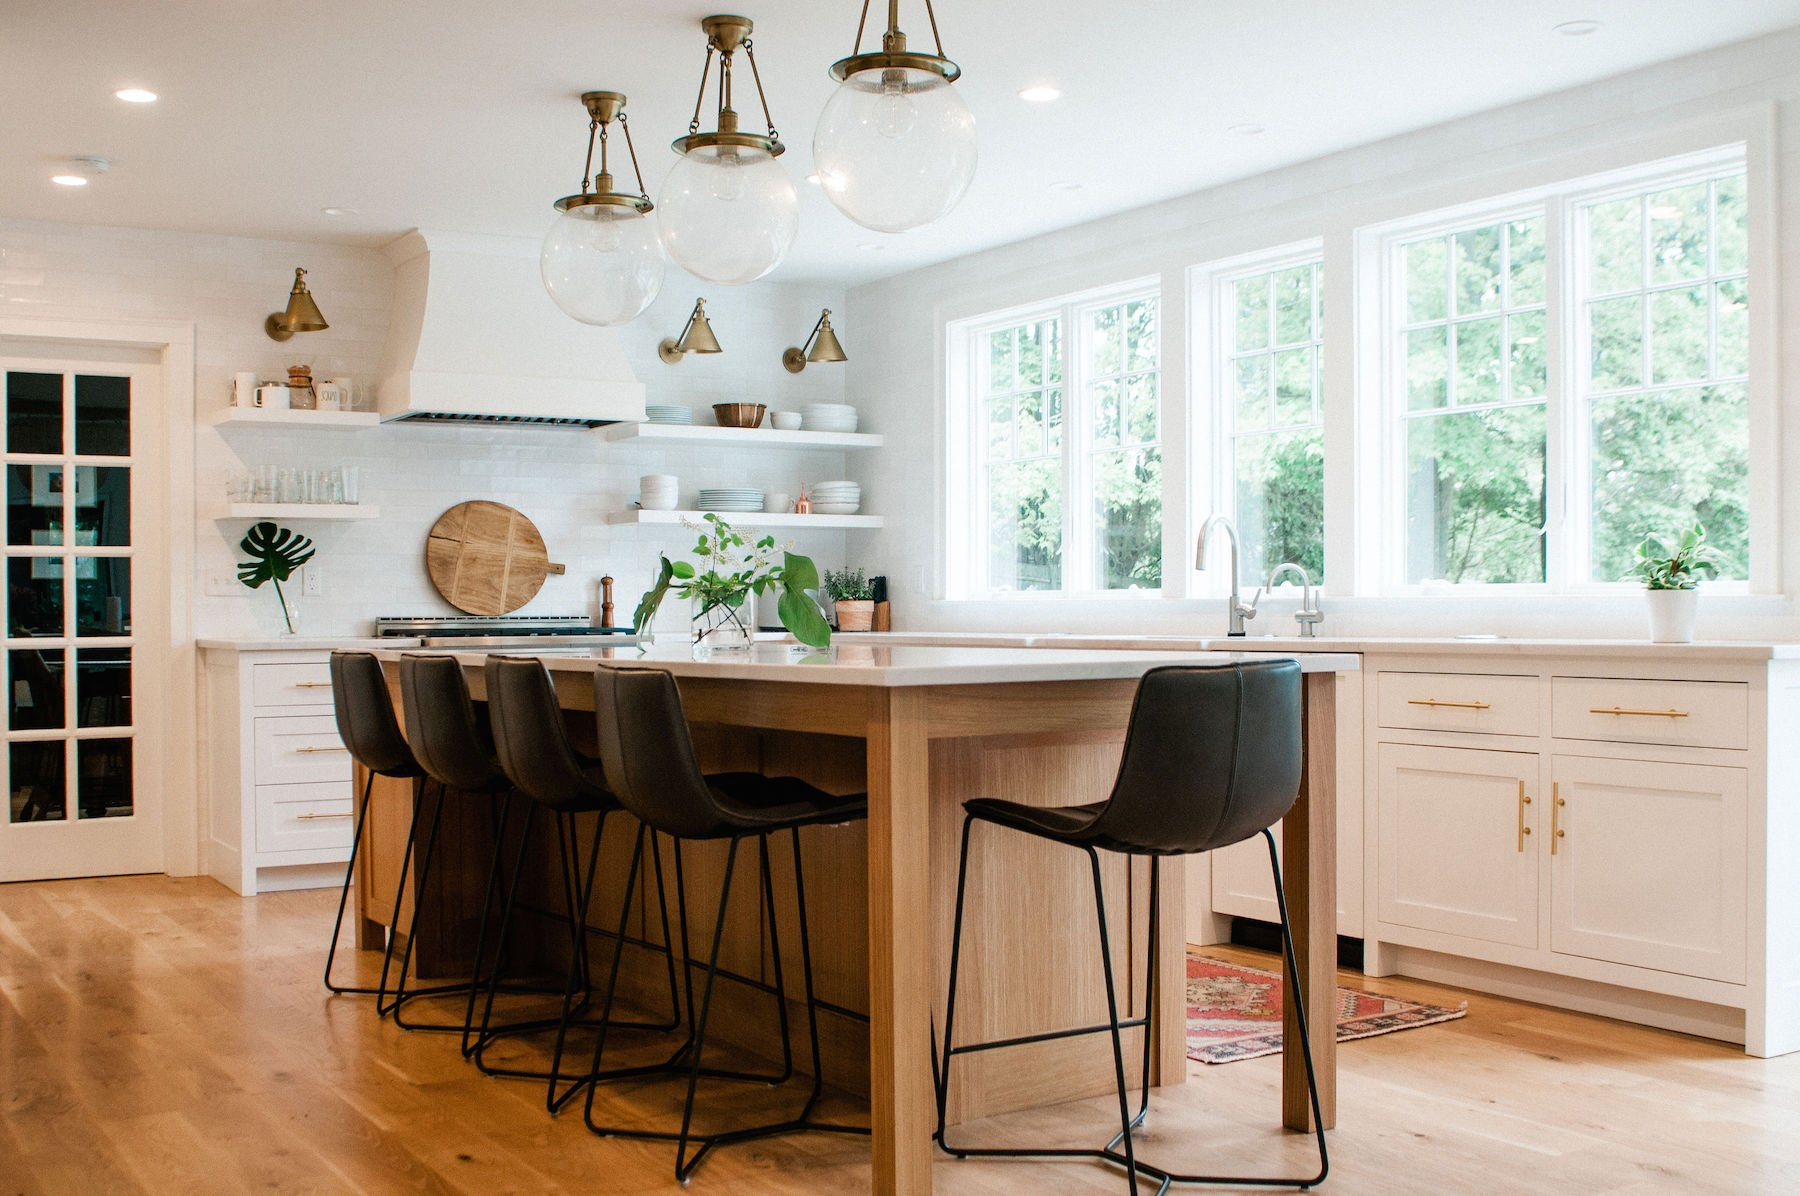 Newburyport Kitchen Tour 2019 Preview Holly Gagne Interior Design Meg Manion photographer